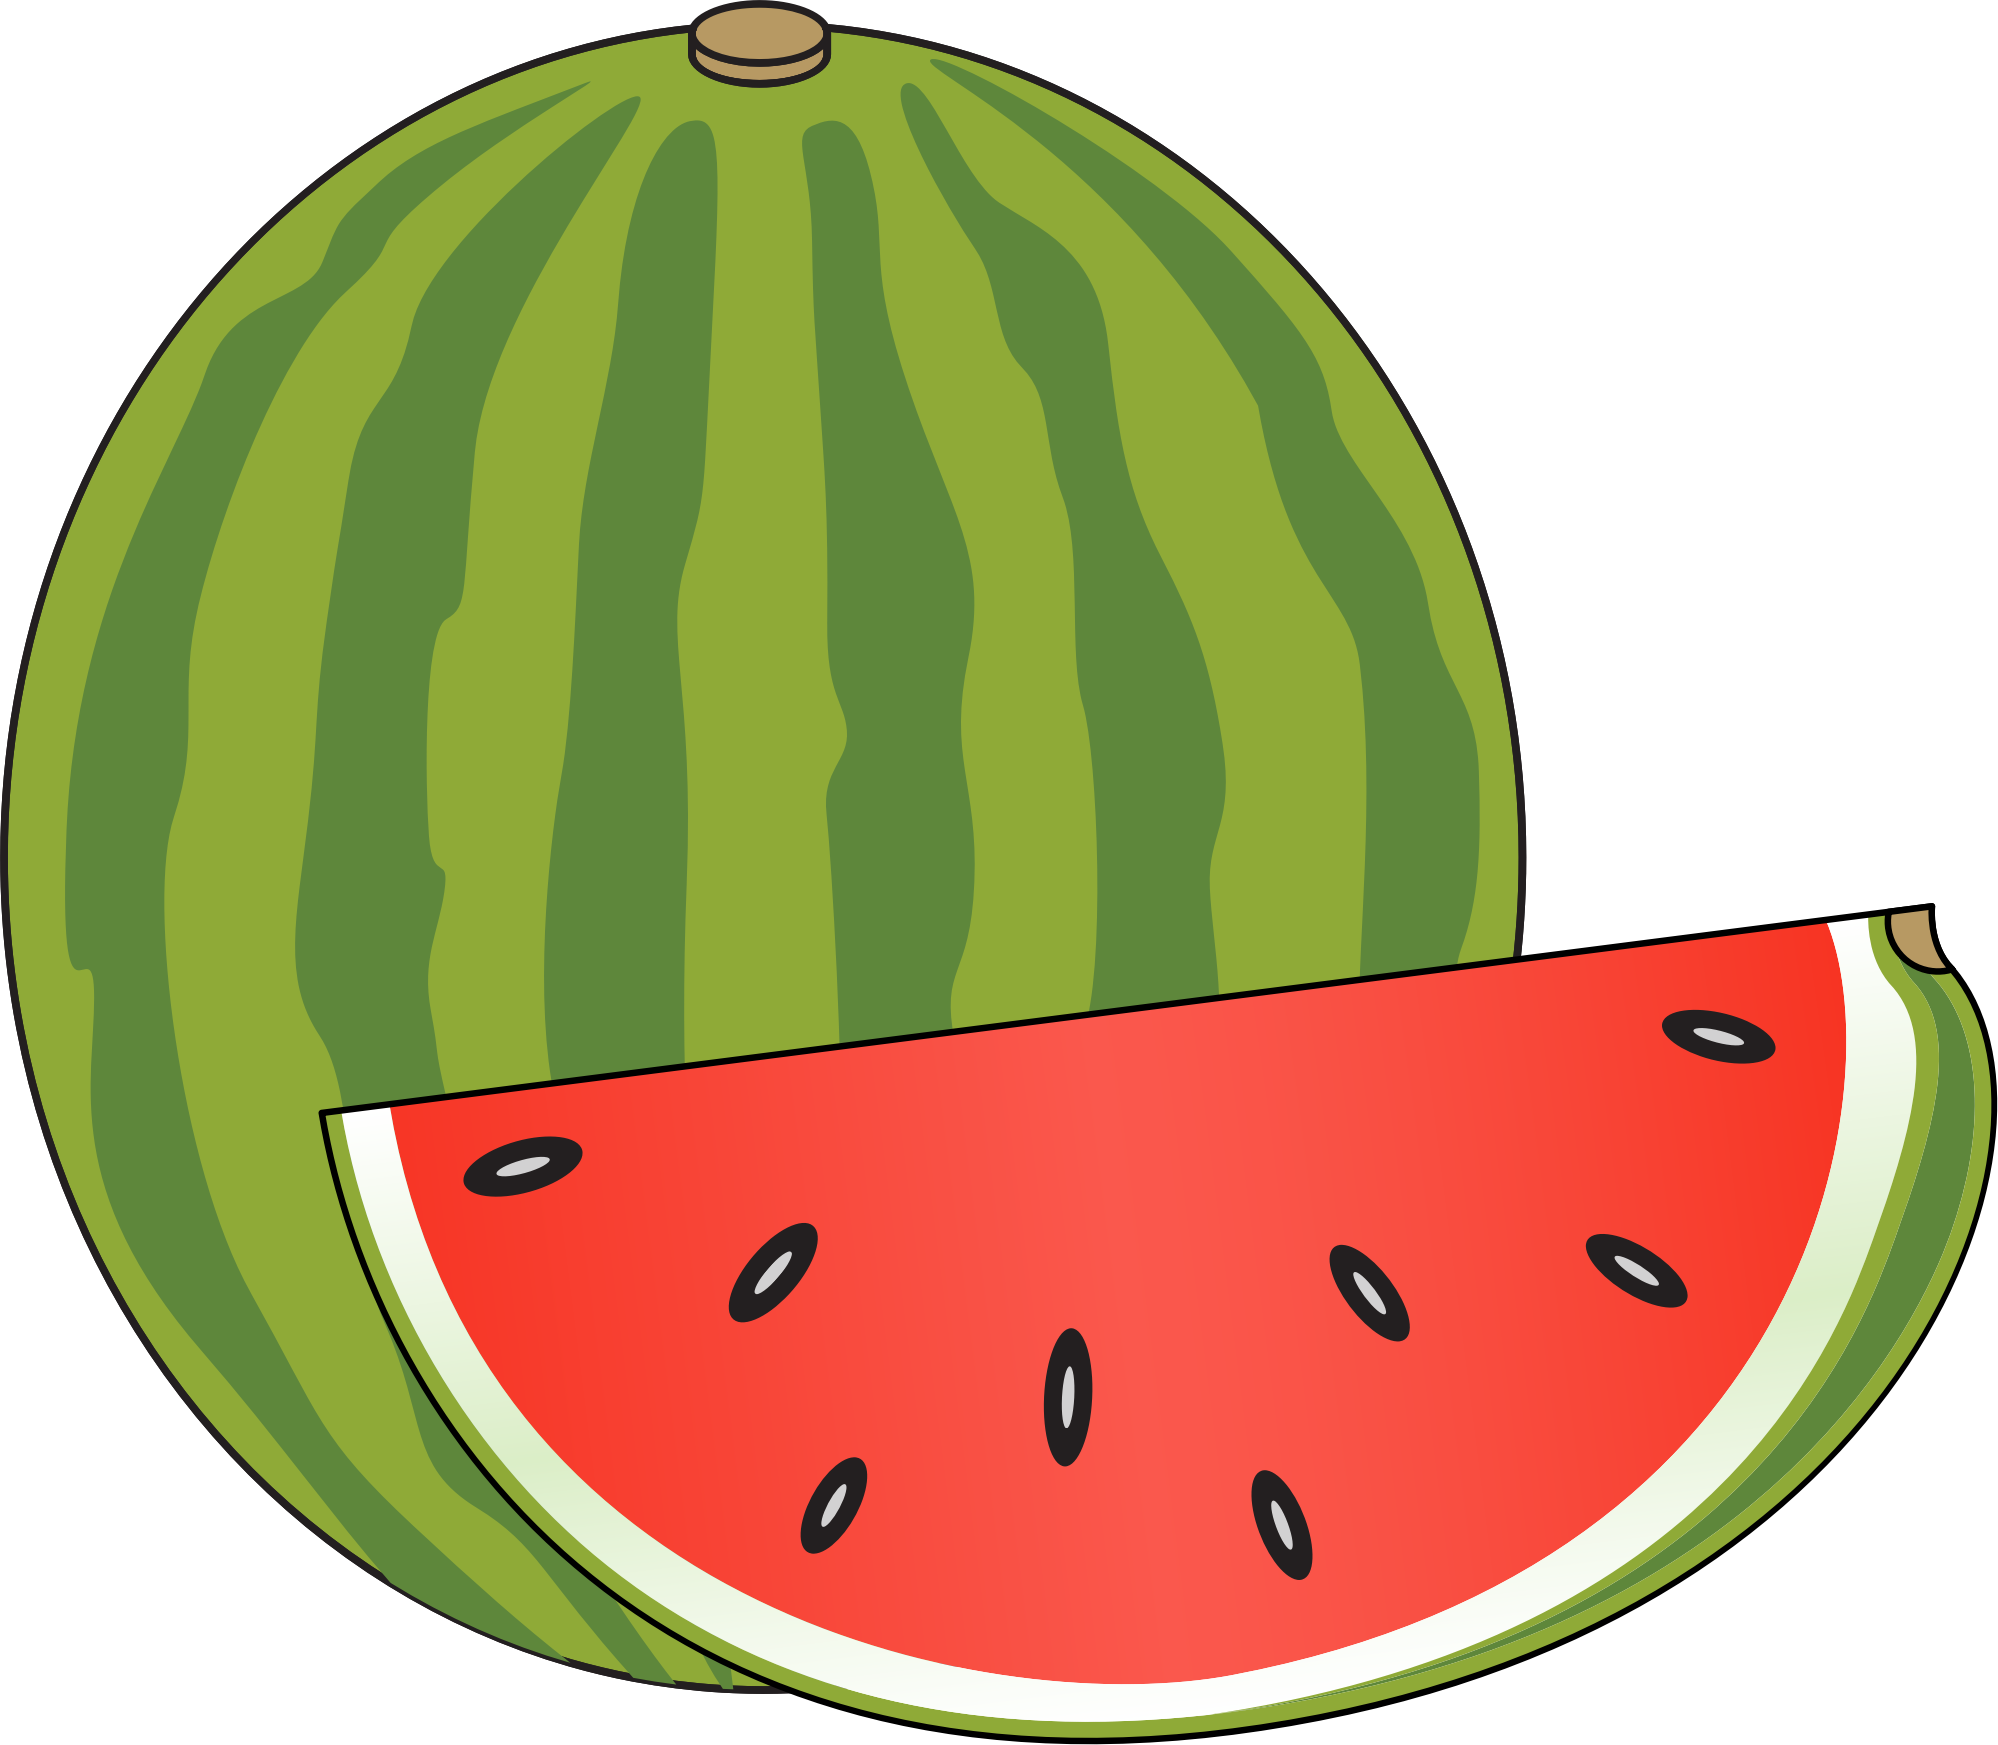 Watermelon By Casino Watermelon Clipart Watermelon Cartoon Watermelon